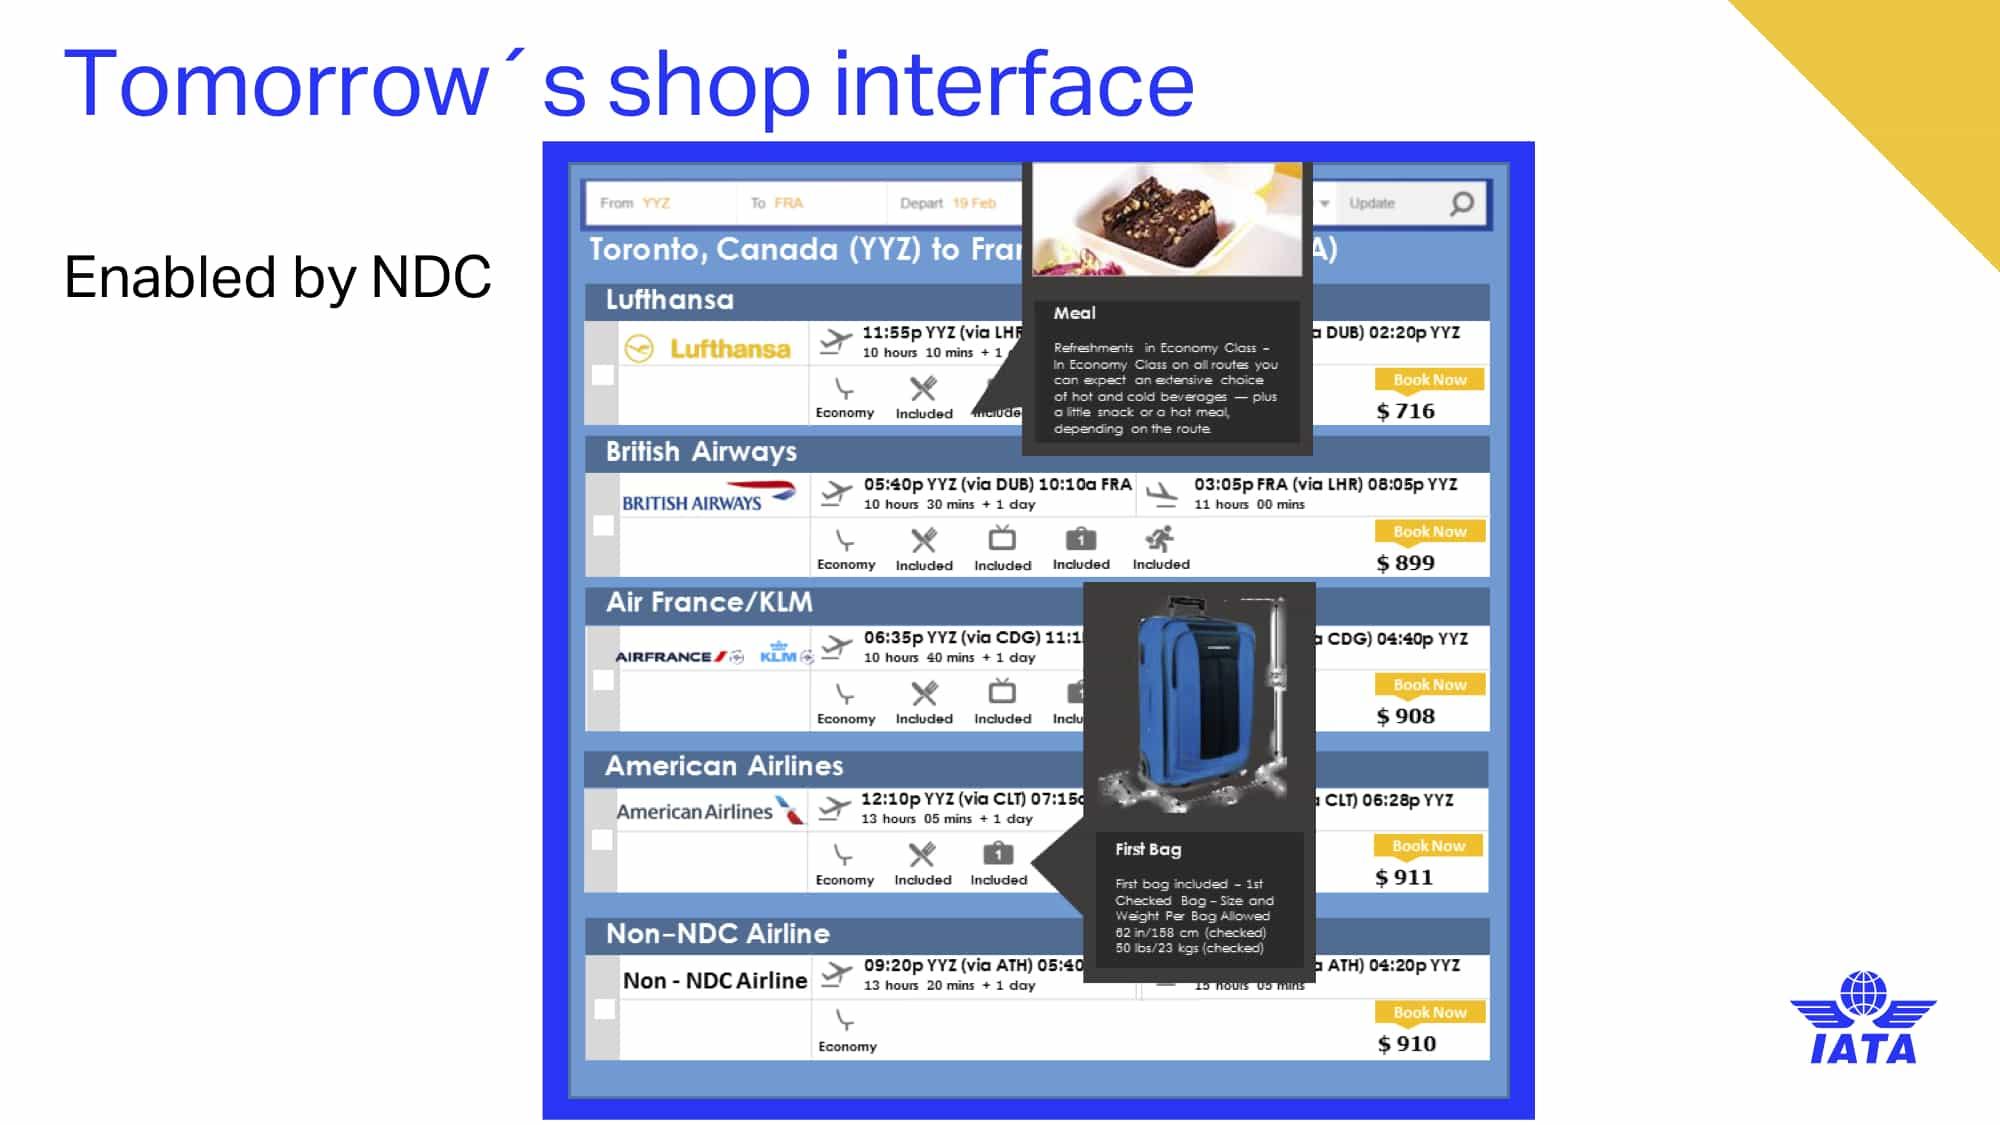 Tomorrow's Shopping Interface